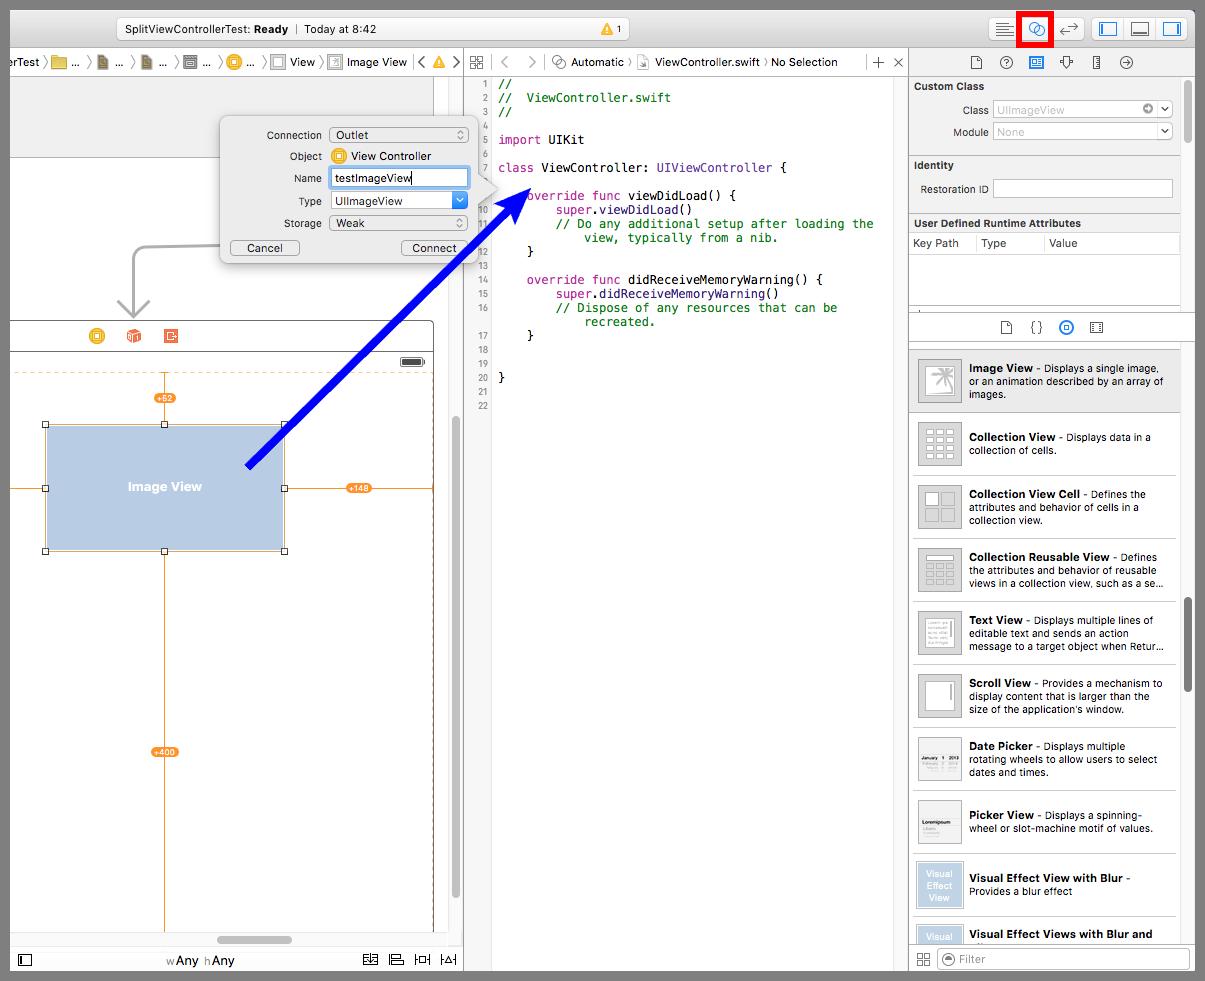 Image Viewとソースコードのコネクションを確立する